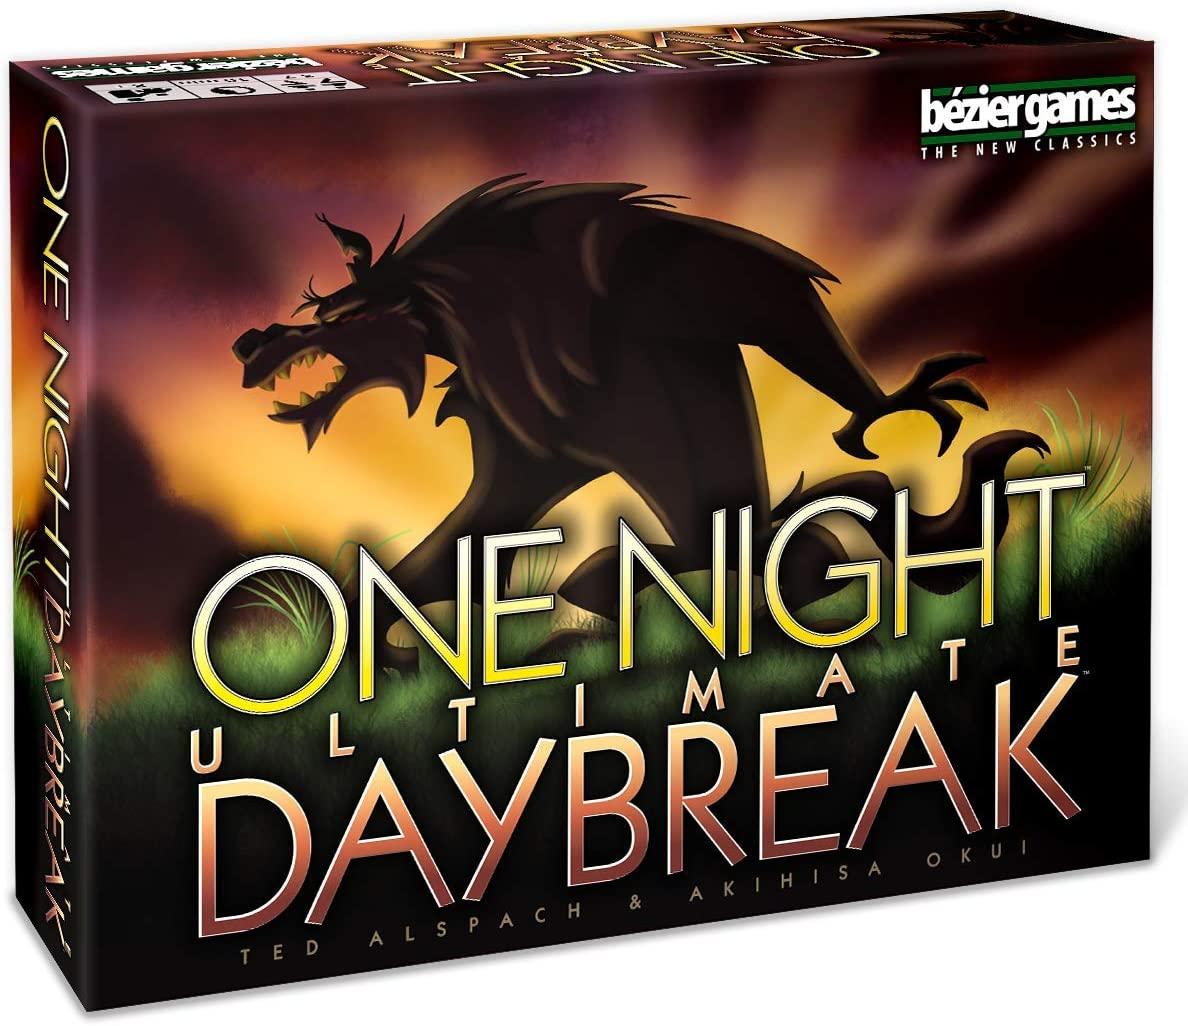 One Night Ultimate Werewolf Daybreak - adult game night ideas